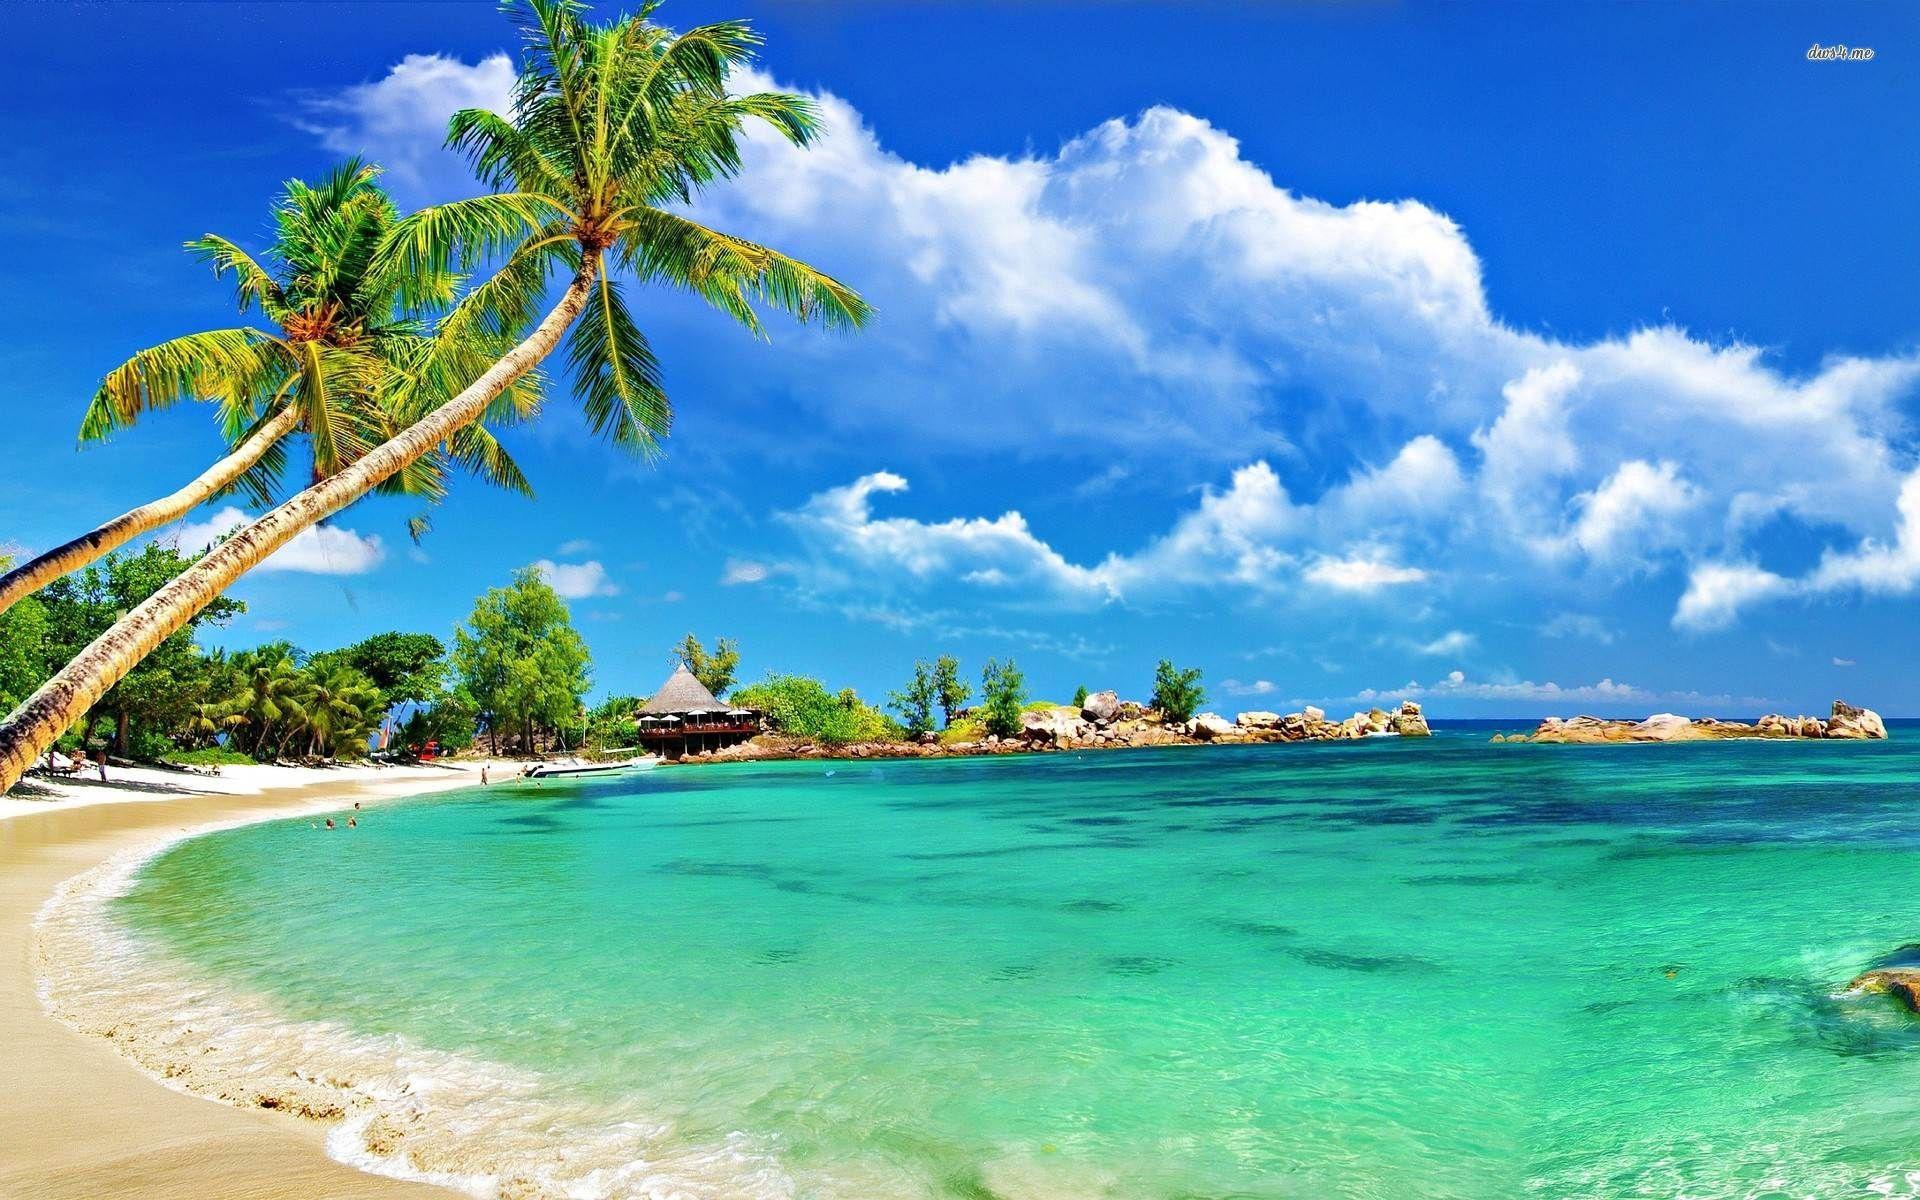 Tropical Island Desktop Wallpapers Wallpaper 1999x1333